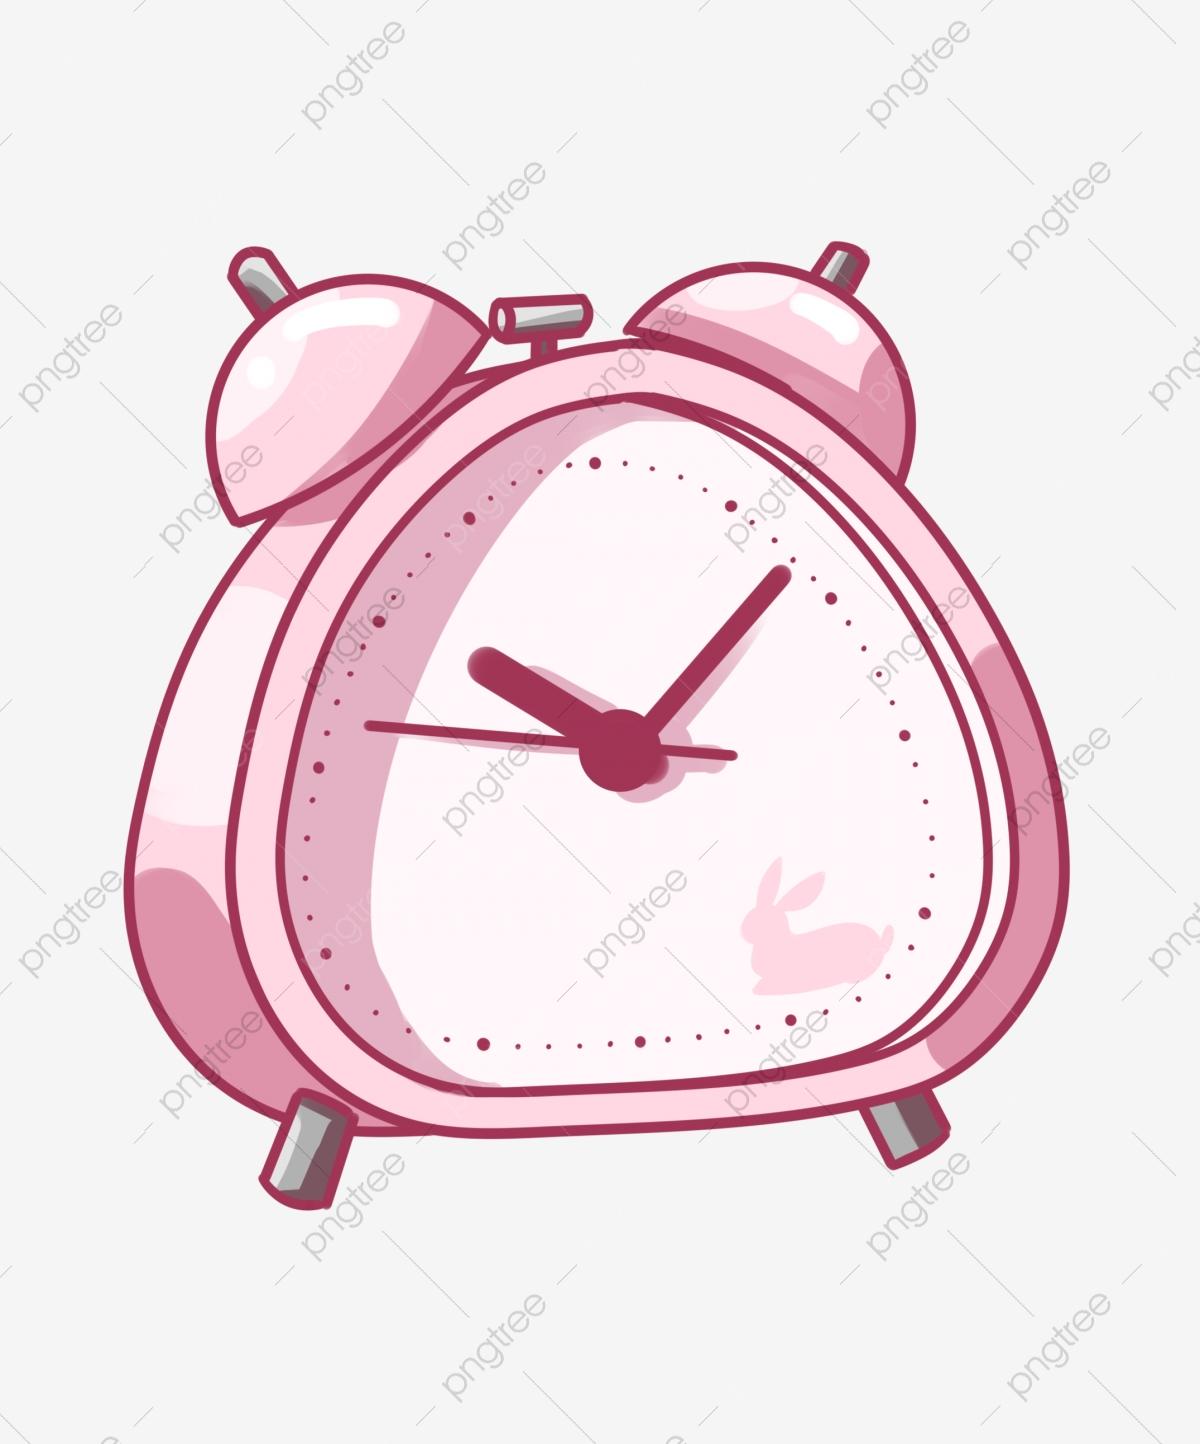 Vector Baseball Alarm Clock, Baseball Clipart, Clock Clipart, Alarm.